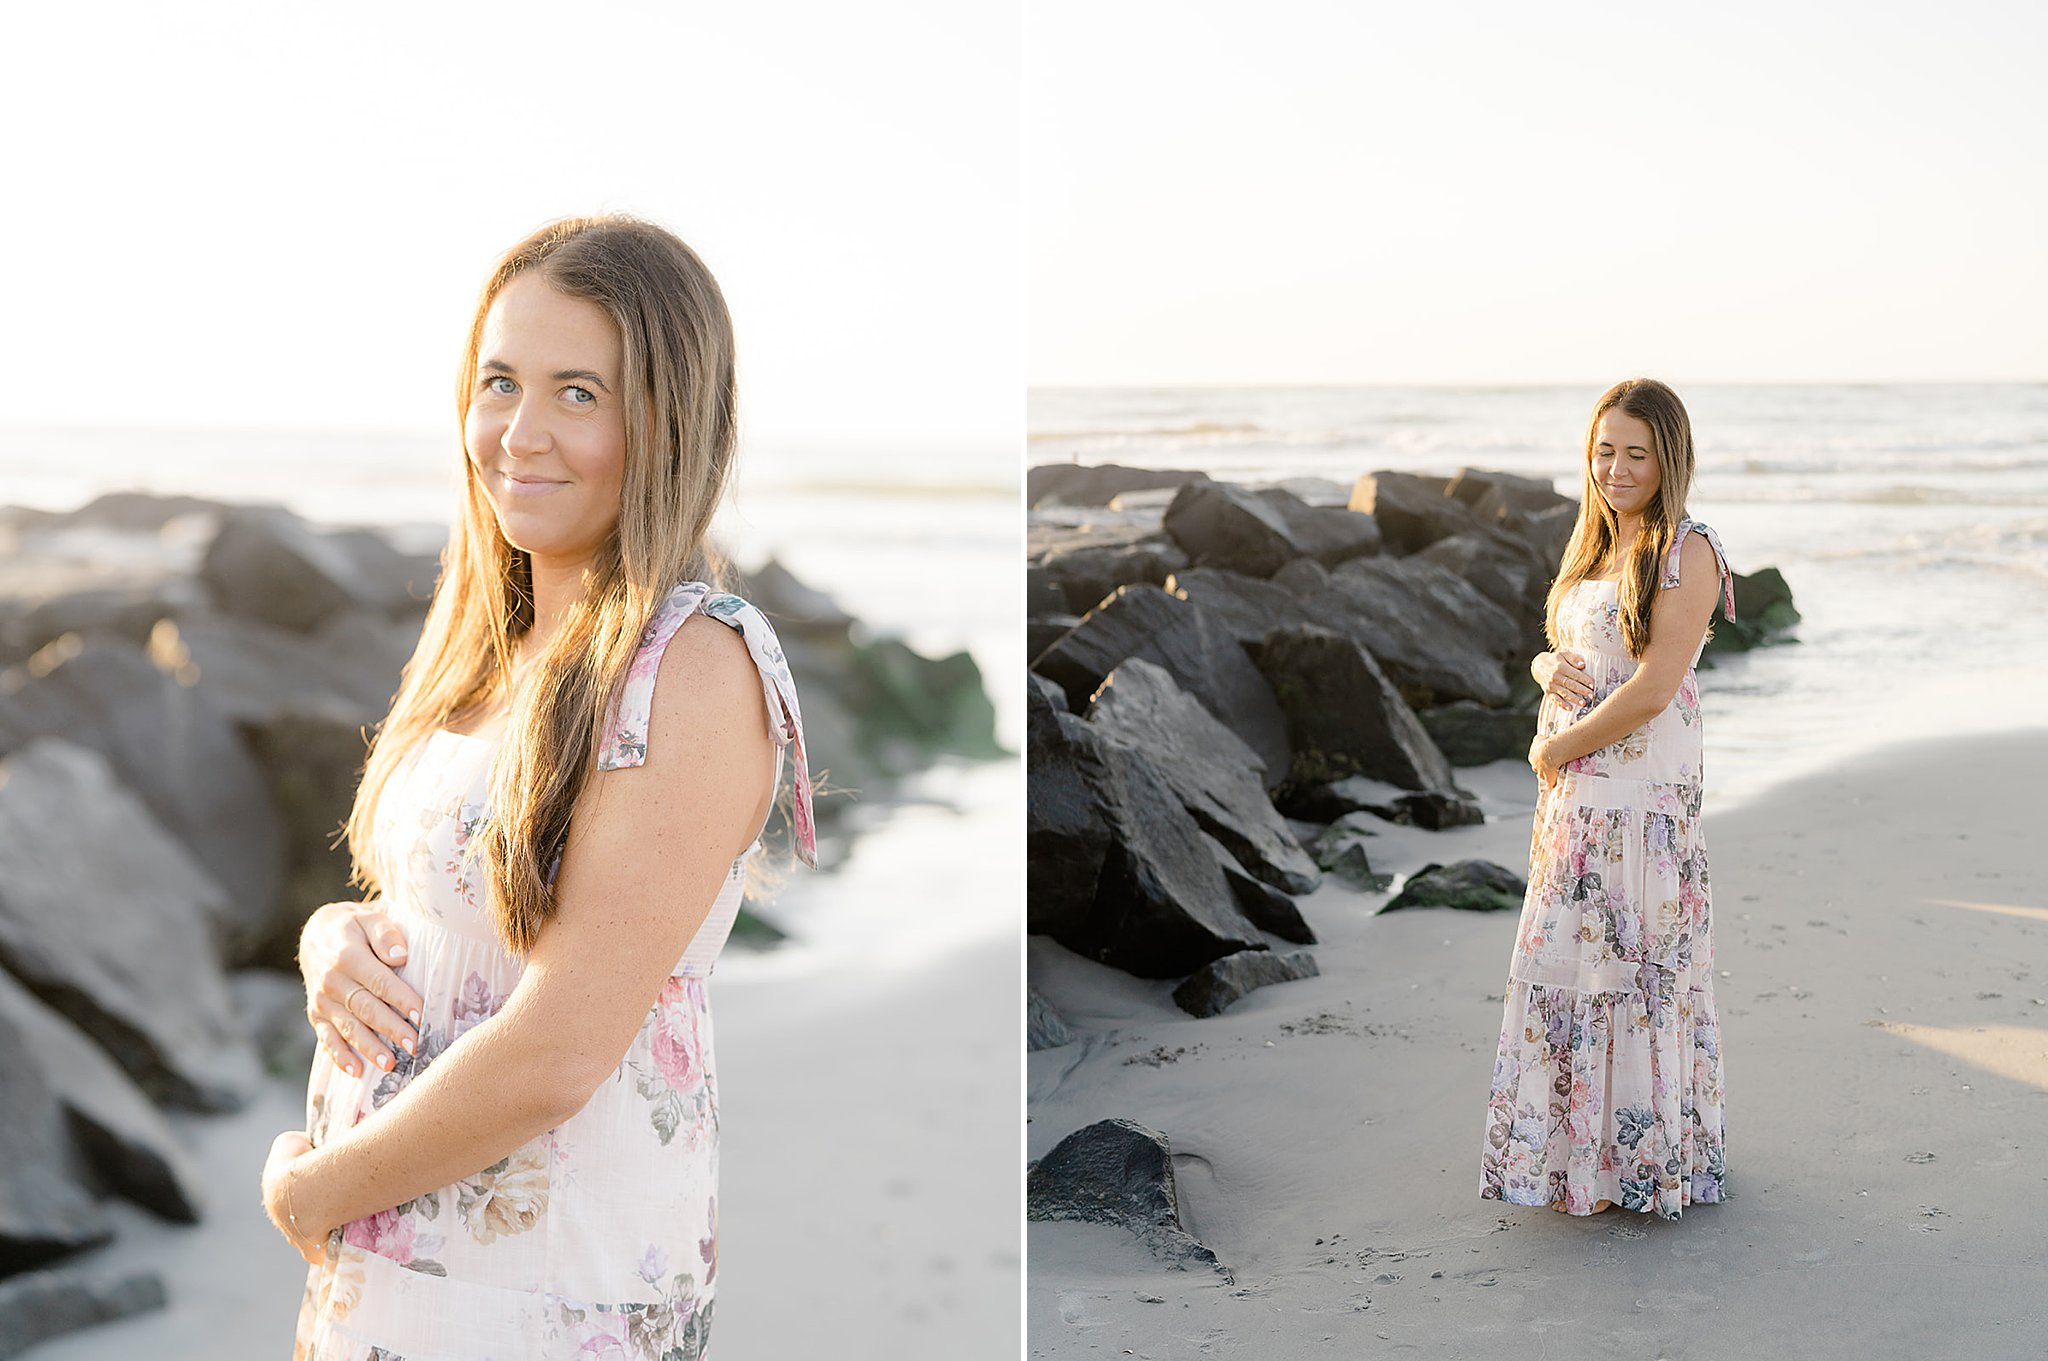 Ocean City NJ Gender Reveal Pregnancy Photography by Magdalena Studios 0031